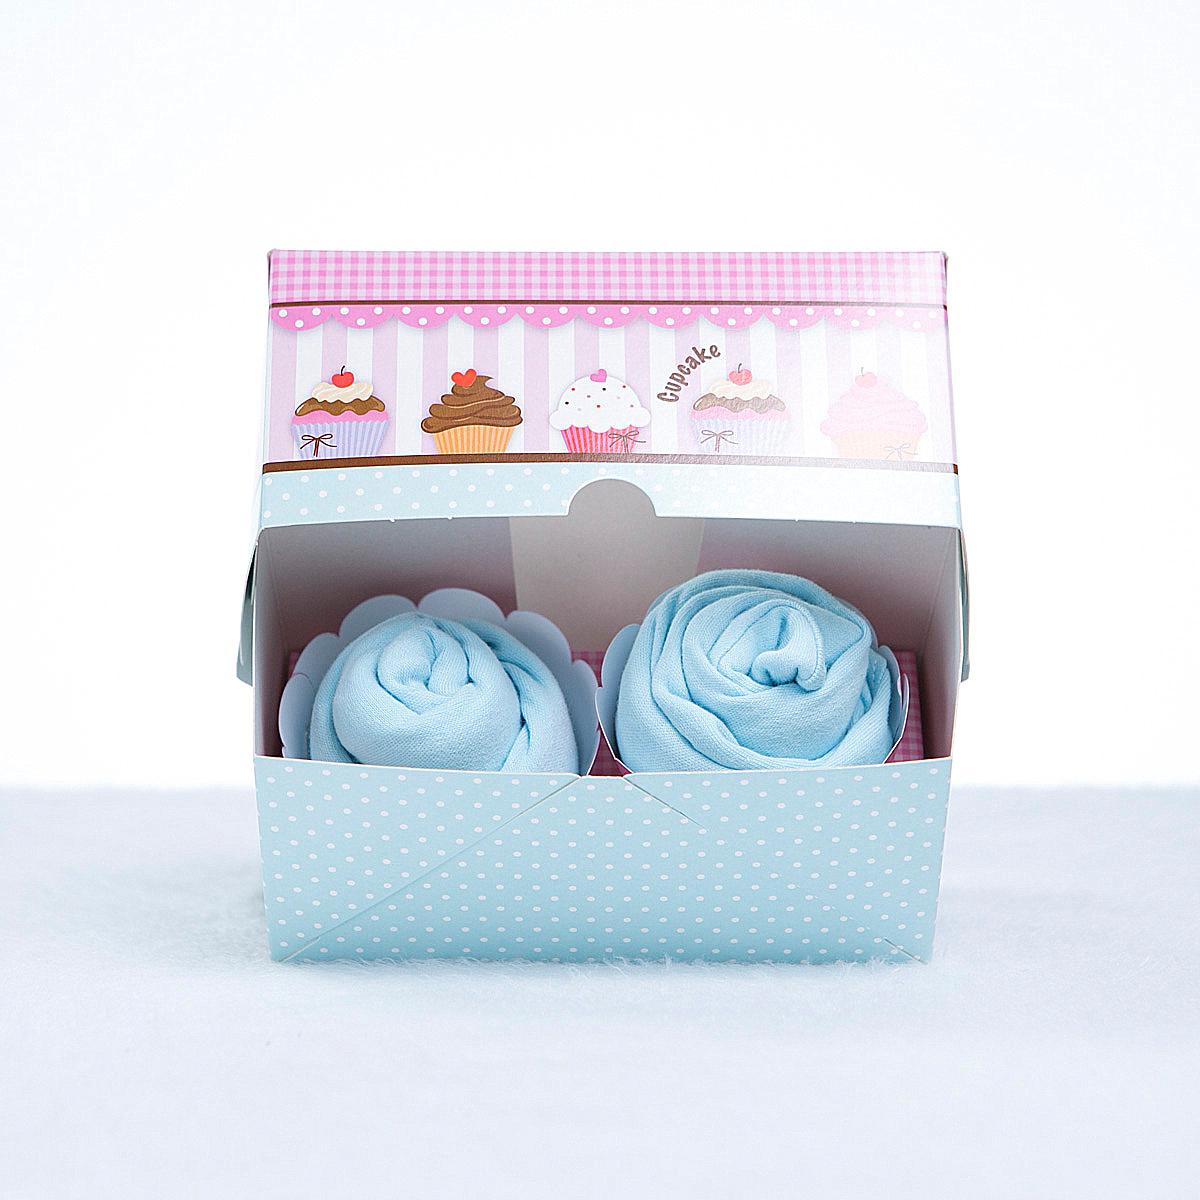 Caixa 2 cupcakes roupas bebe azul menino